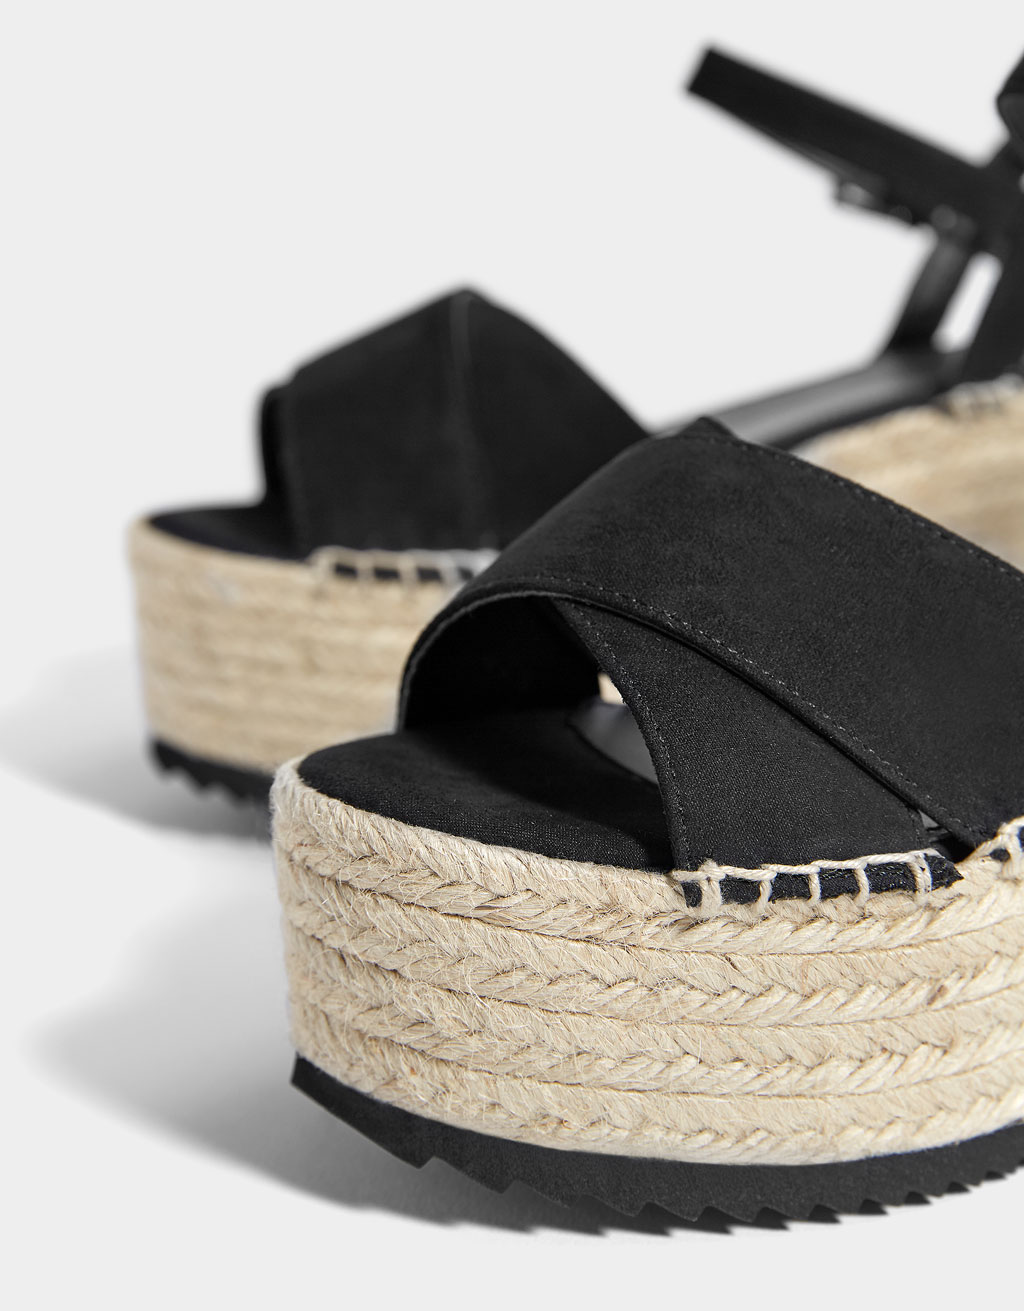 fbaaeedec36b Black jute platform sandals Black jute platform sandals ...